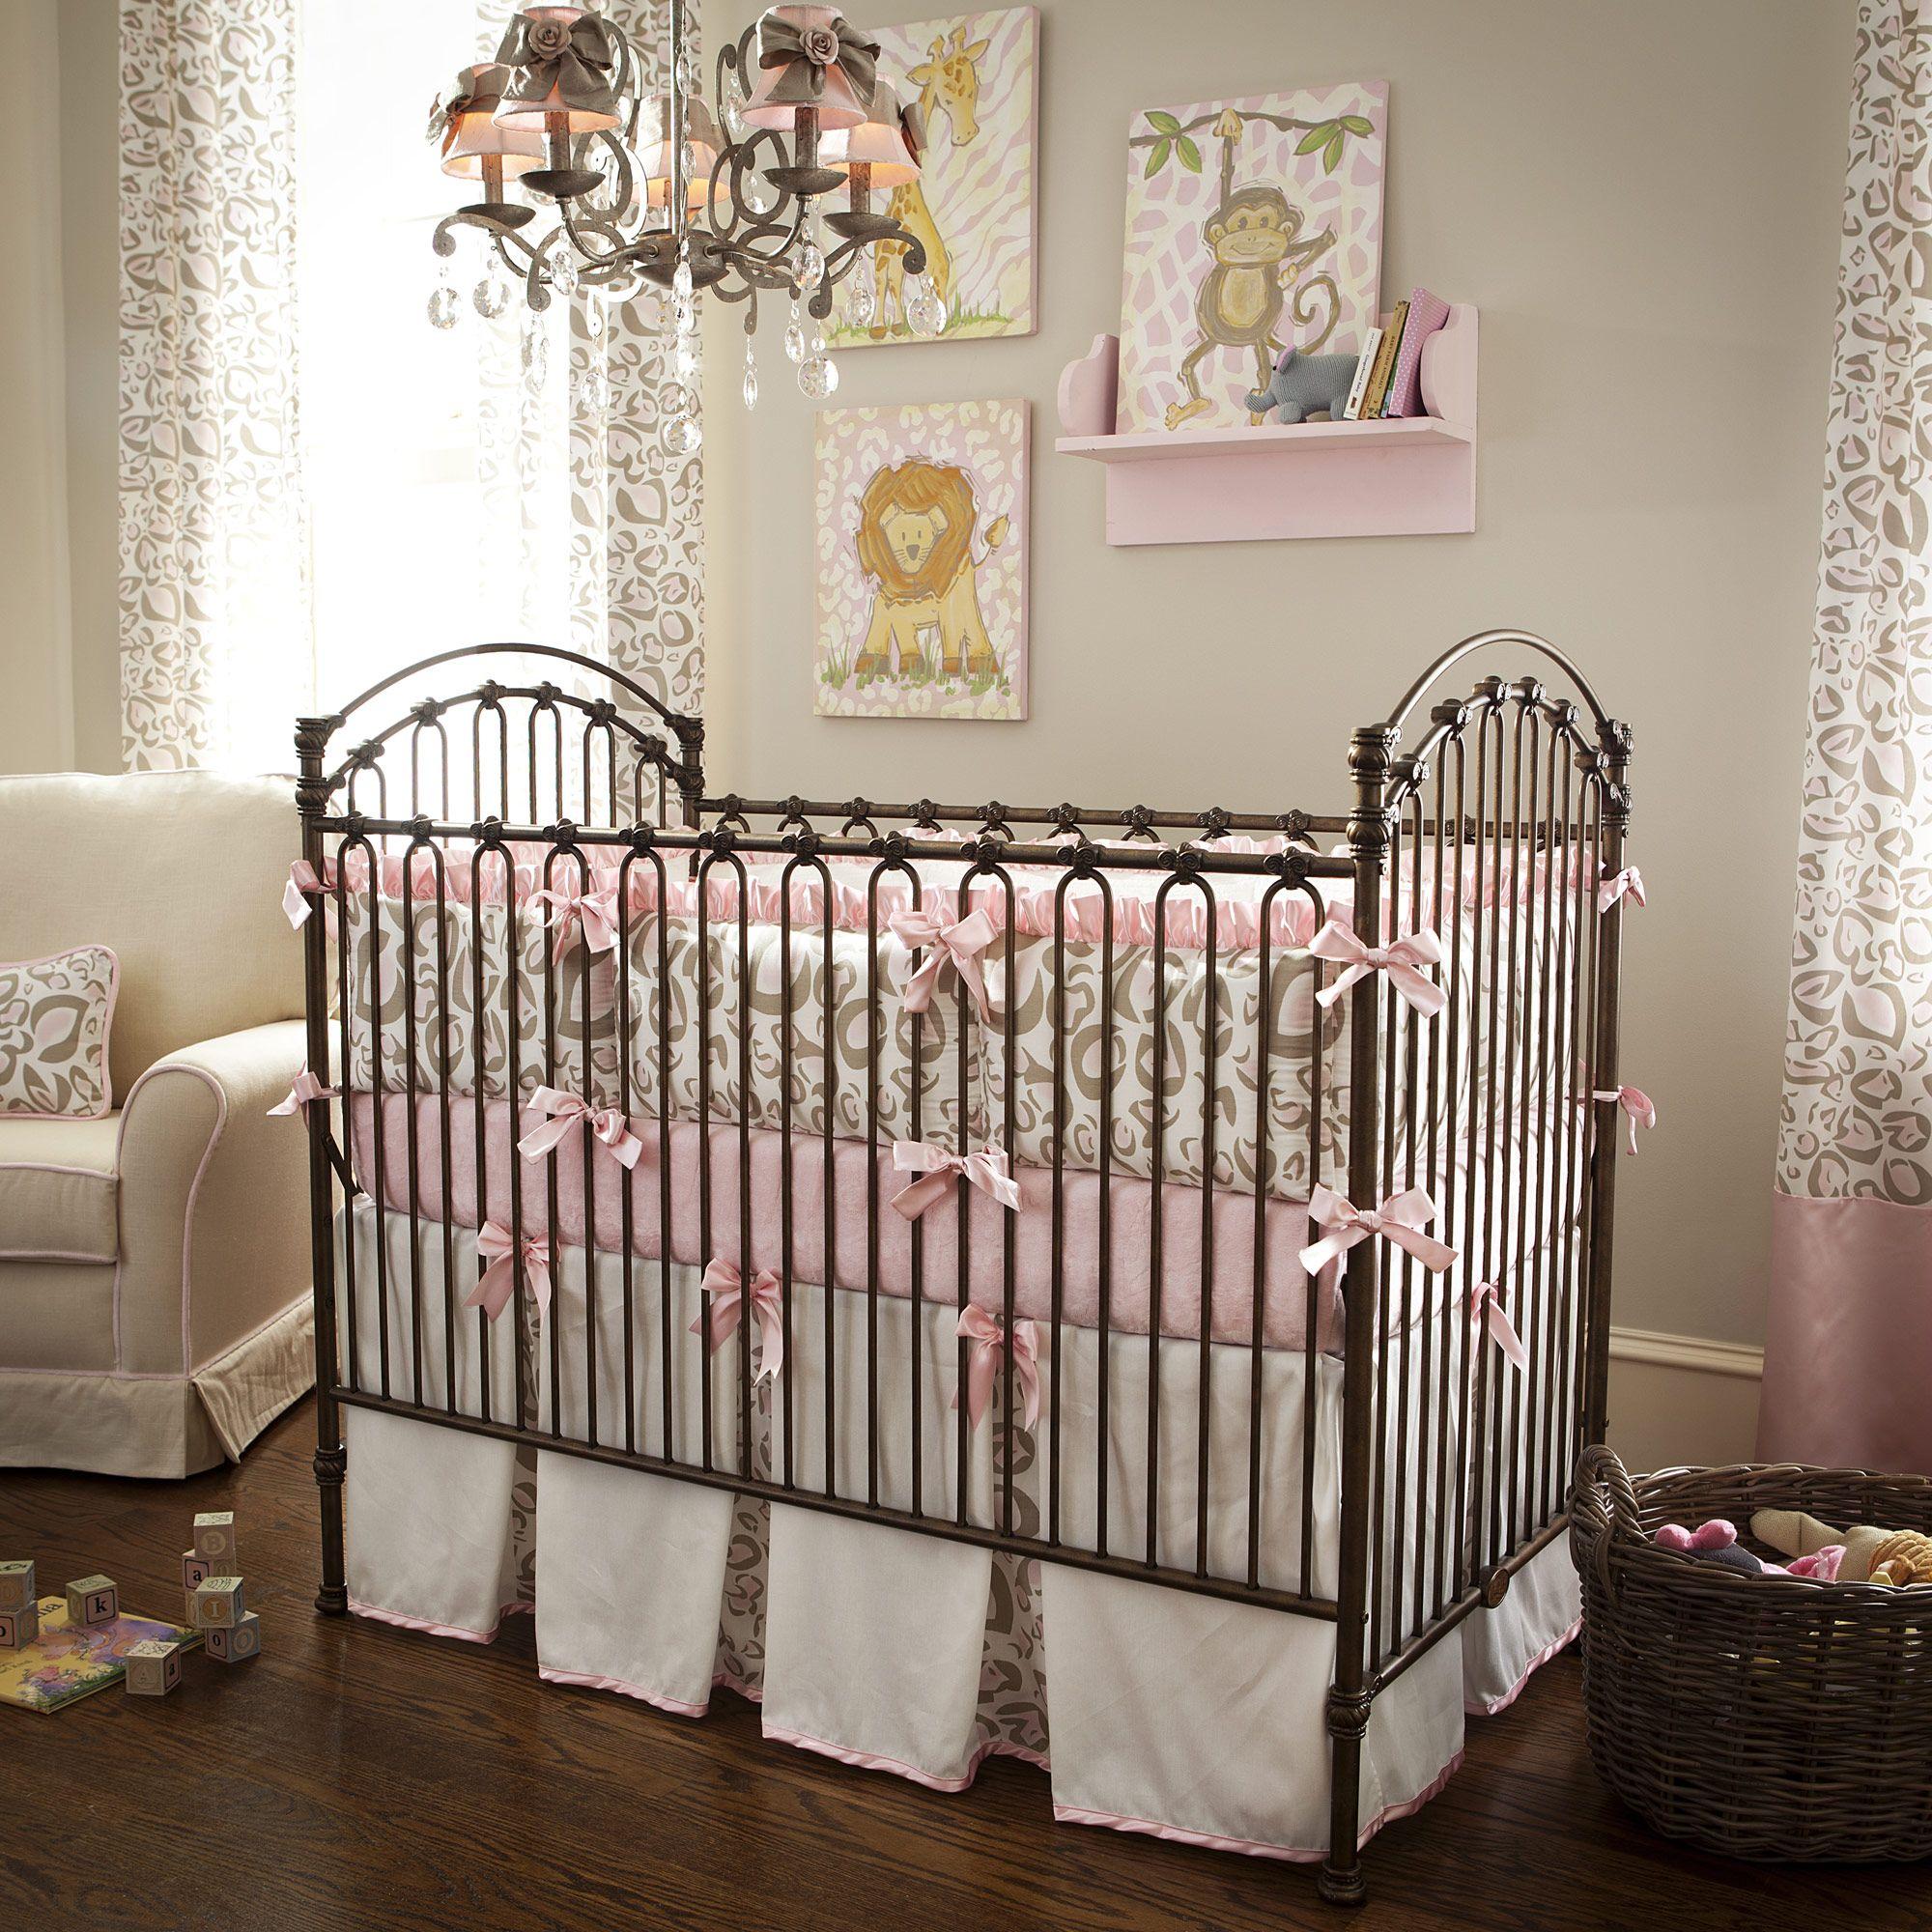 Enchanting White Ruffle Comforter For Bedroom Decoration Ideas - Light pink nursery decor